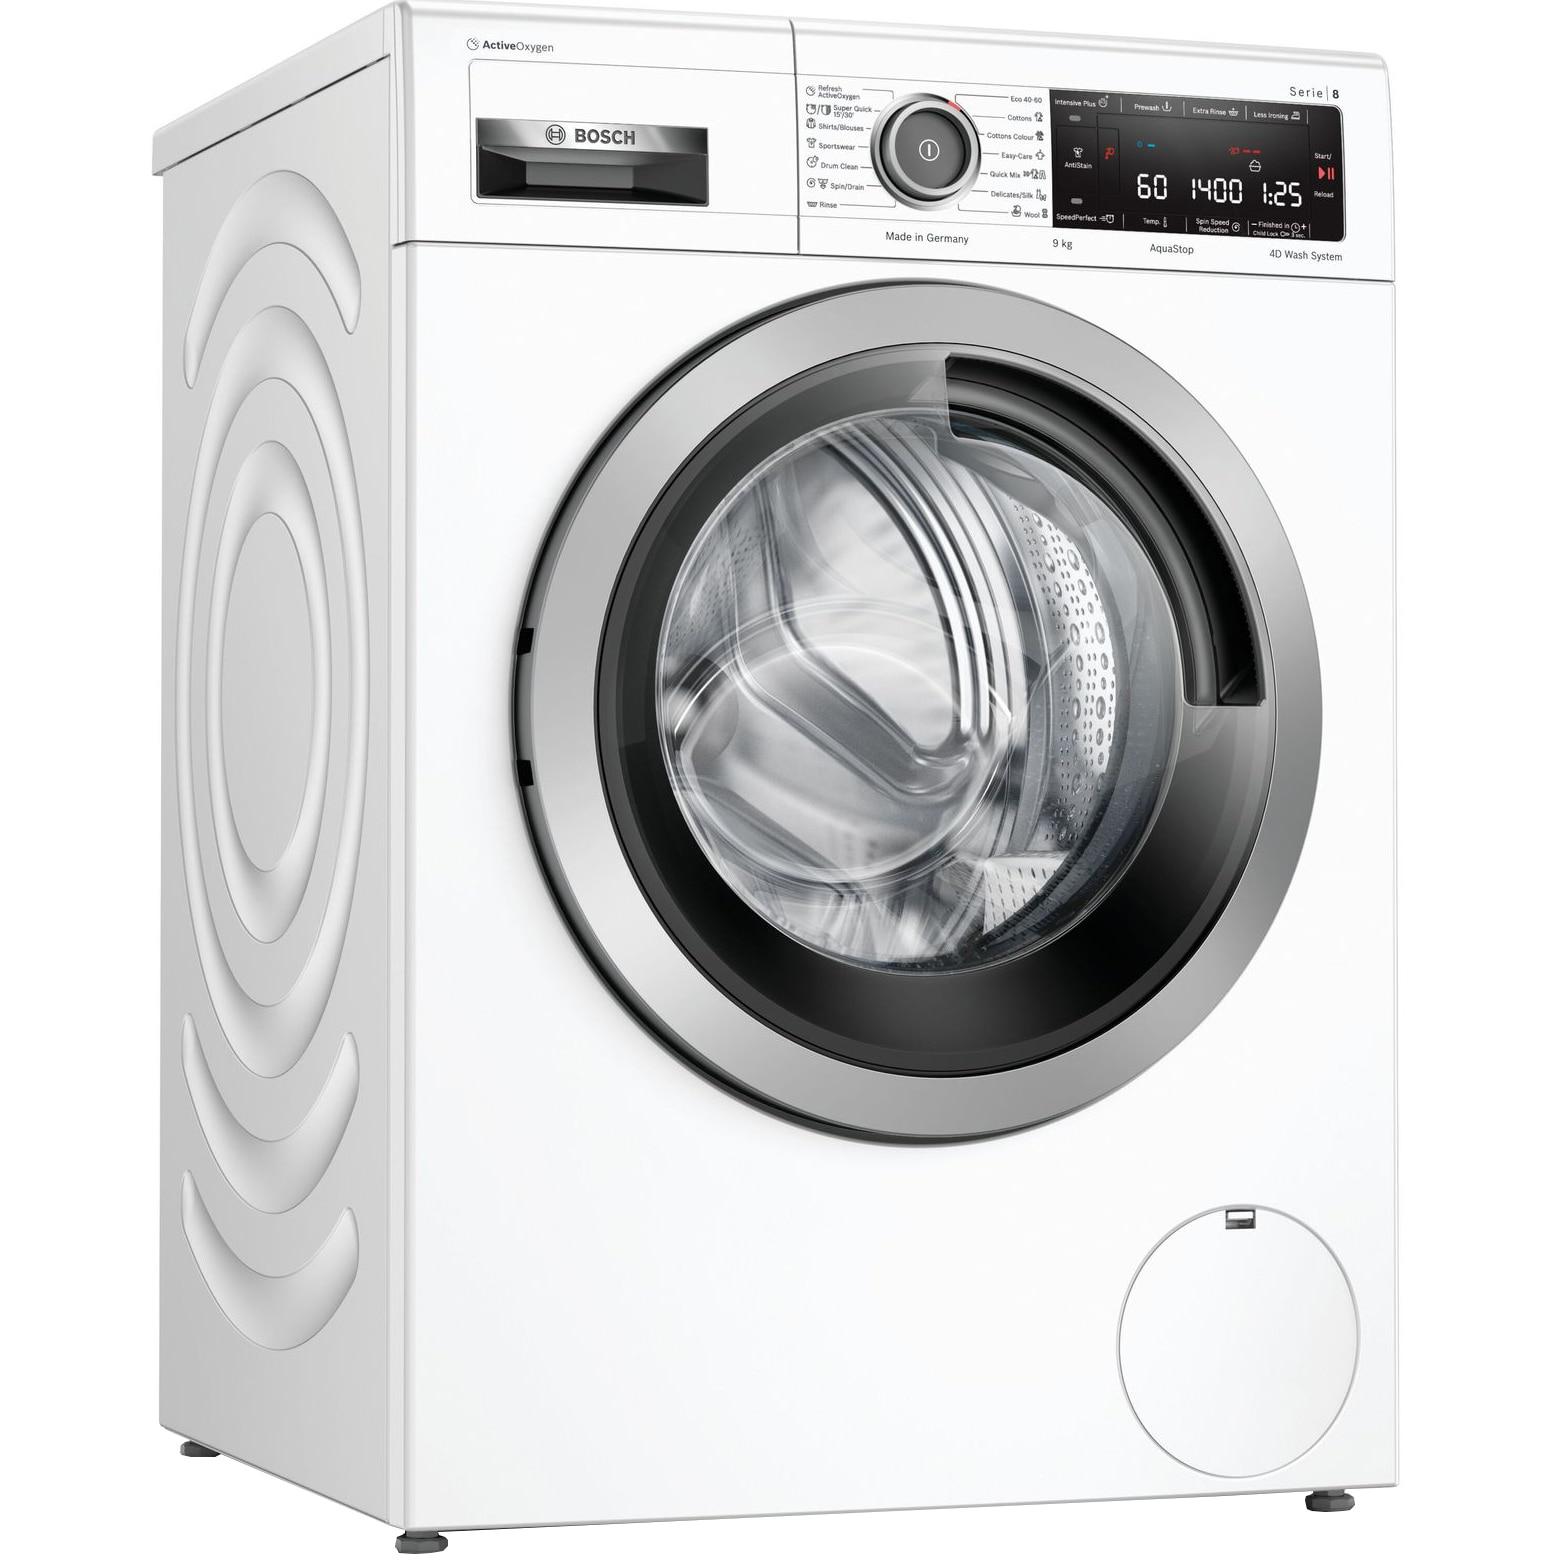 Fotografie Masina de spalat rufe Bosch WAV28L90BY, 9 kg, 1400 RPM, Clasa B, EcoSilence Drive, ActiveOxygen, AntiPete, Alb